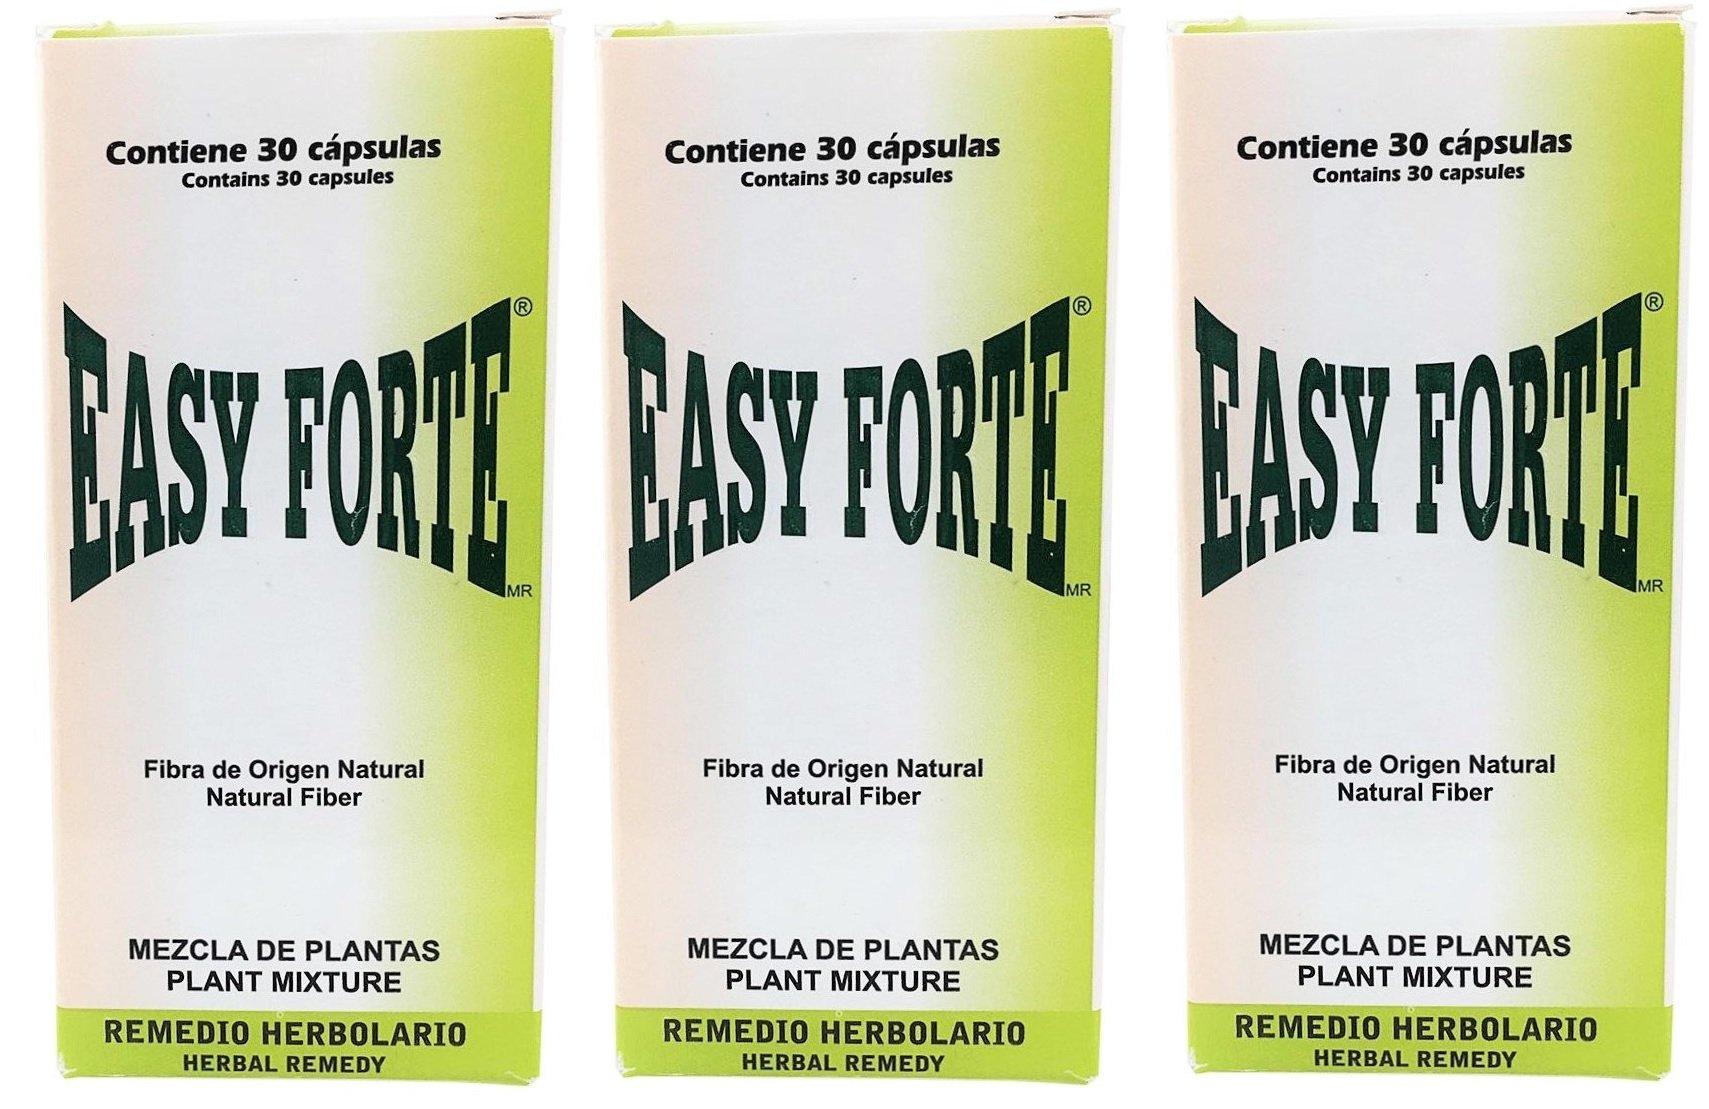 Easy Figure Easy Forte the original from mexico Bajar de peso 3 cajas by Easy Figure Easy Forte